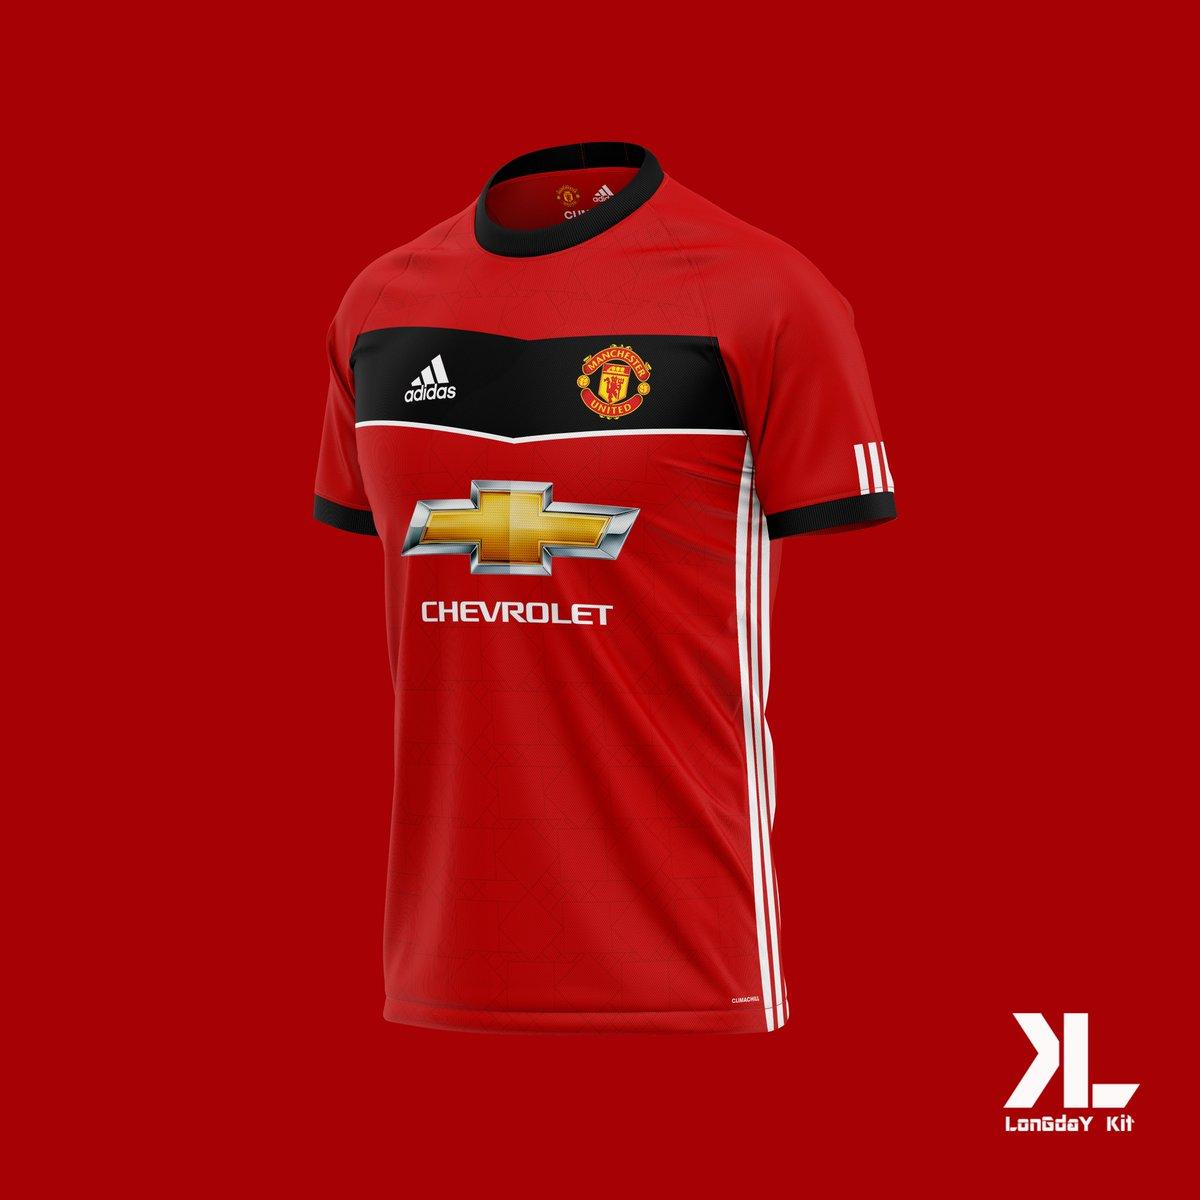 Manchester United x Adidas x Kits Concepts  #MUFC #ManUtd #ManU #Reddevils #oldtrafford #adidasfootball  #PremierLeague #Manchester #ManchesterUnited   #kitconcept #footballkit  RT & Like Appreciated https://t.co/E2Q4sF4rwk